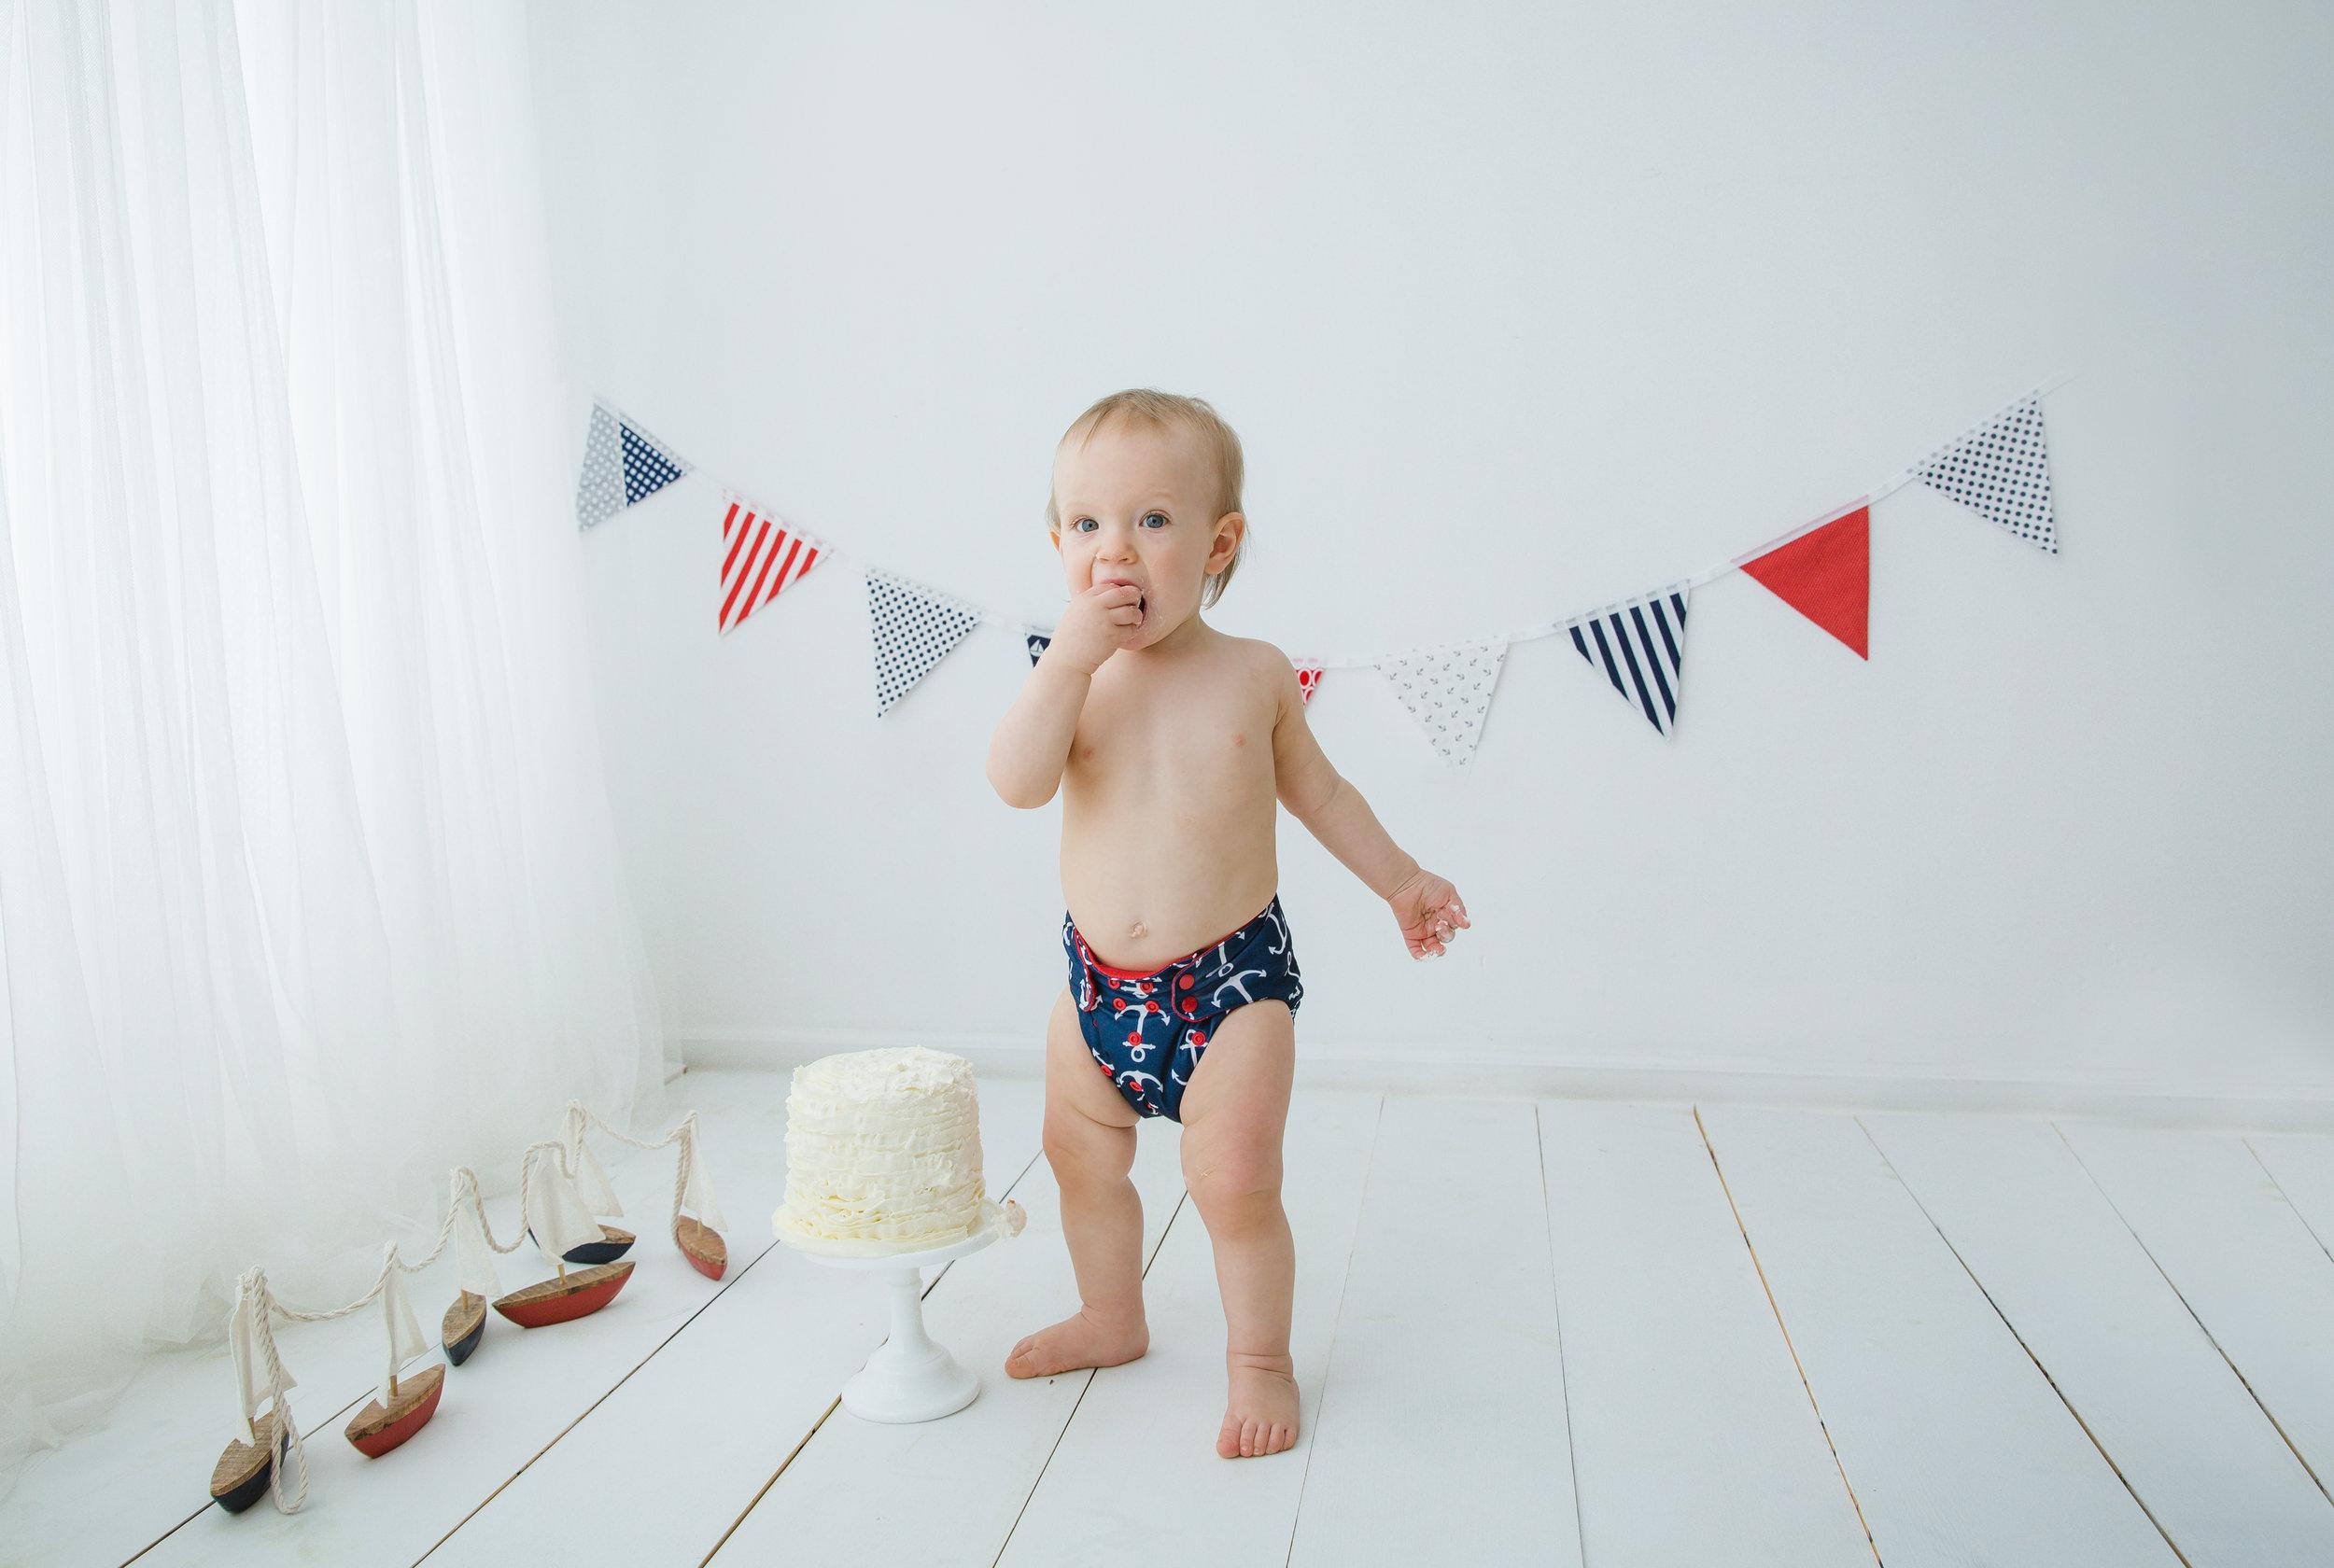 little boy with a nautical cake smash theme eating his cake in burlington nj photo studio